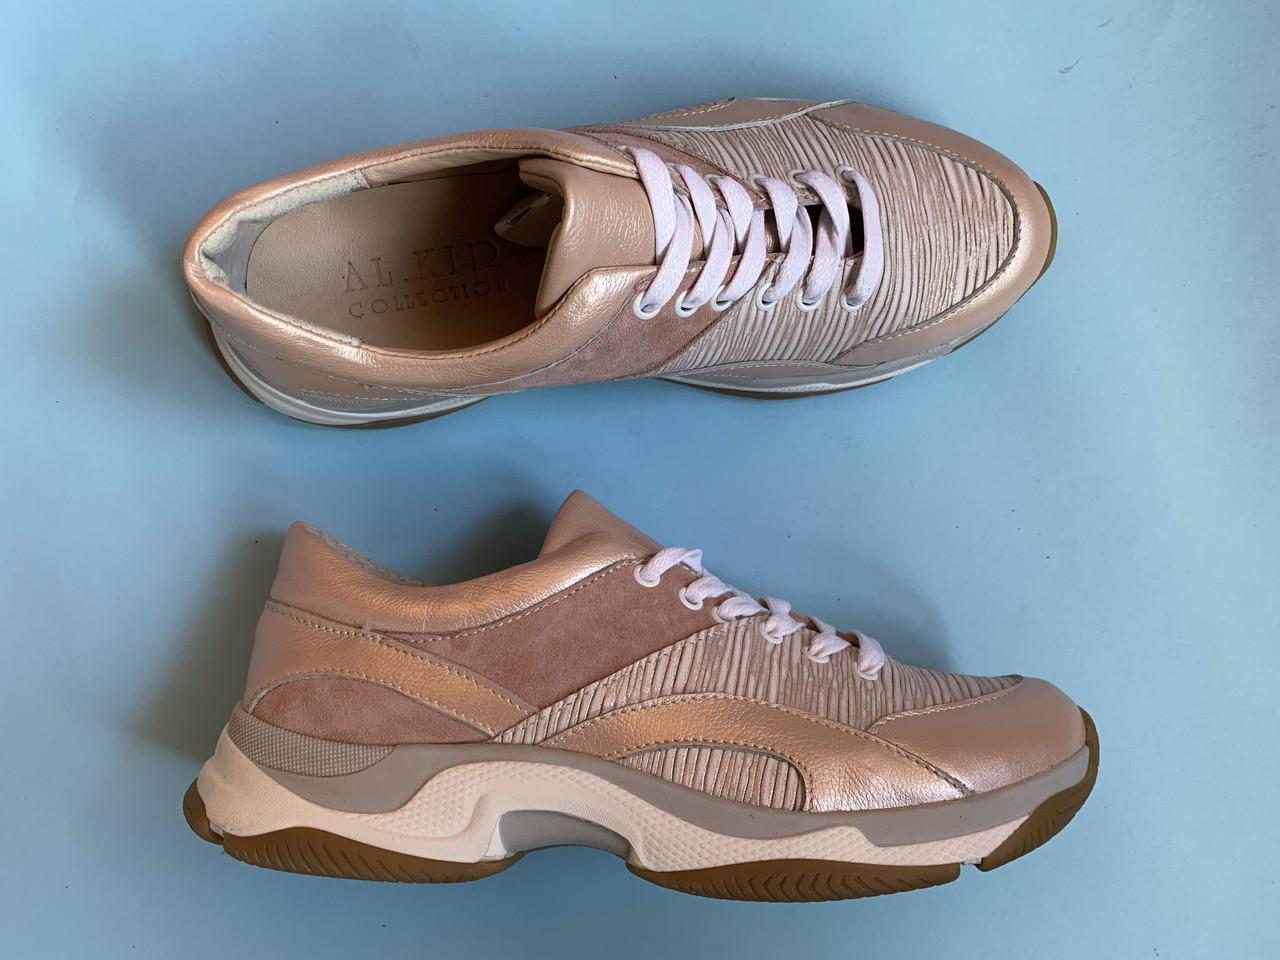 Кроссовки 508-20 пудра перл + пудра замш + пудра полоса (крос 3 беж след)